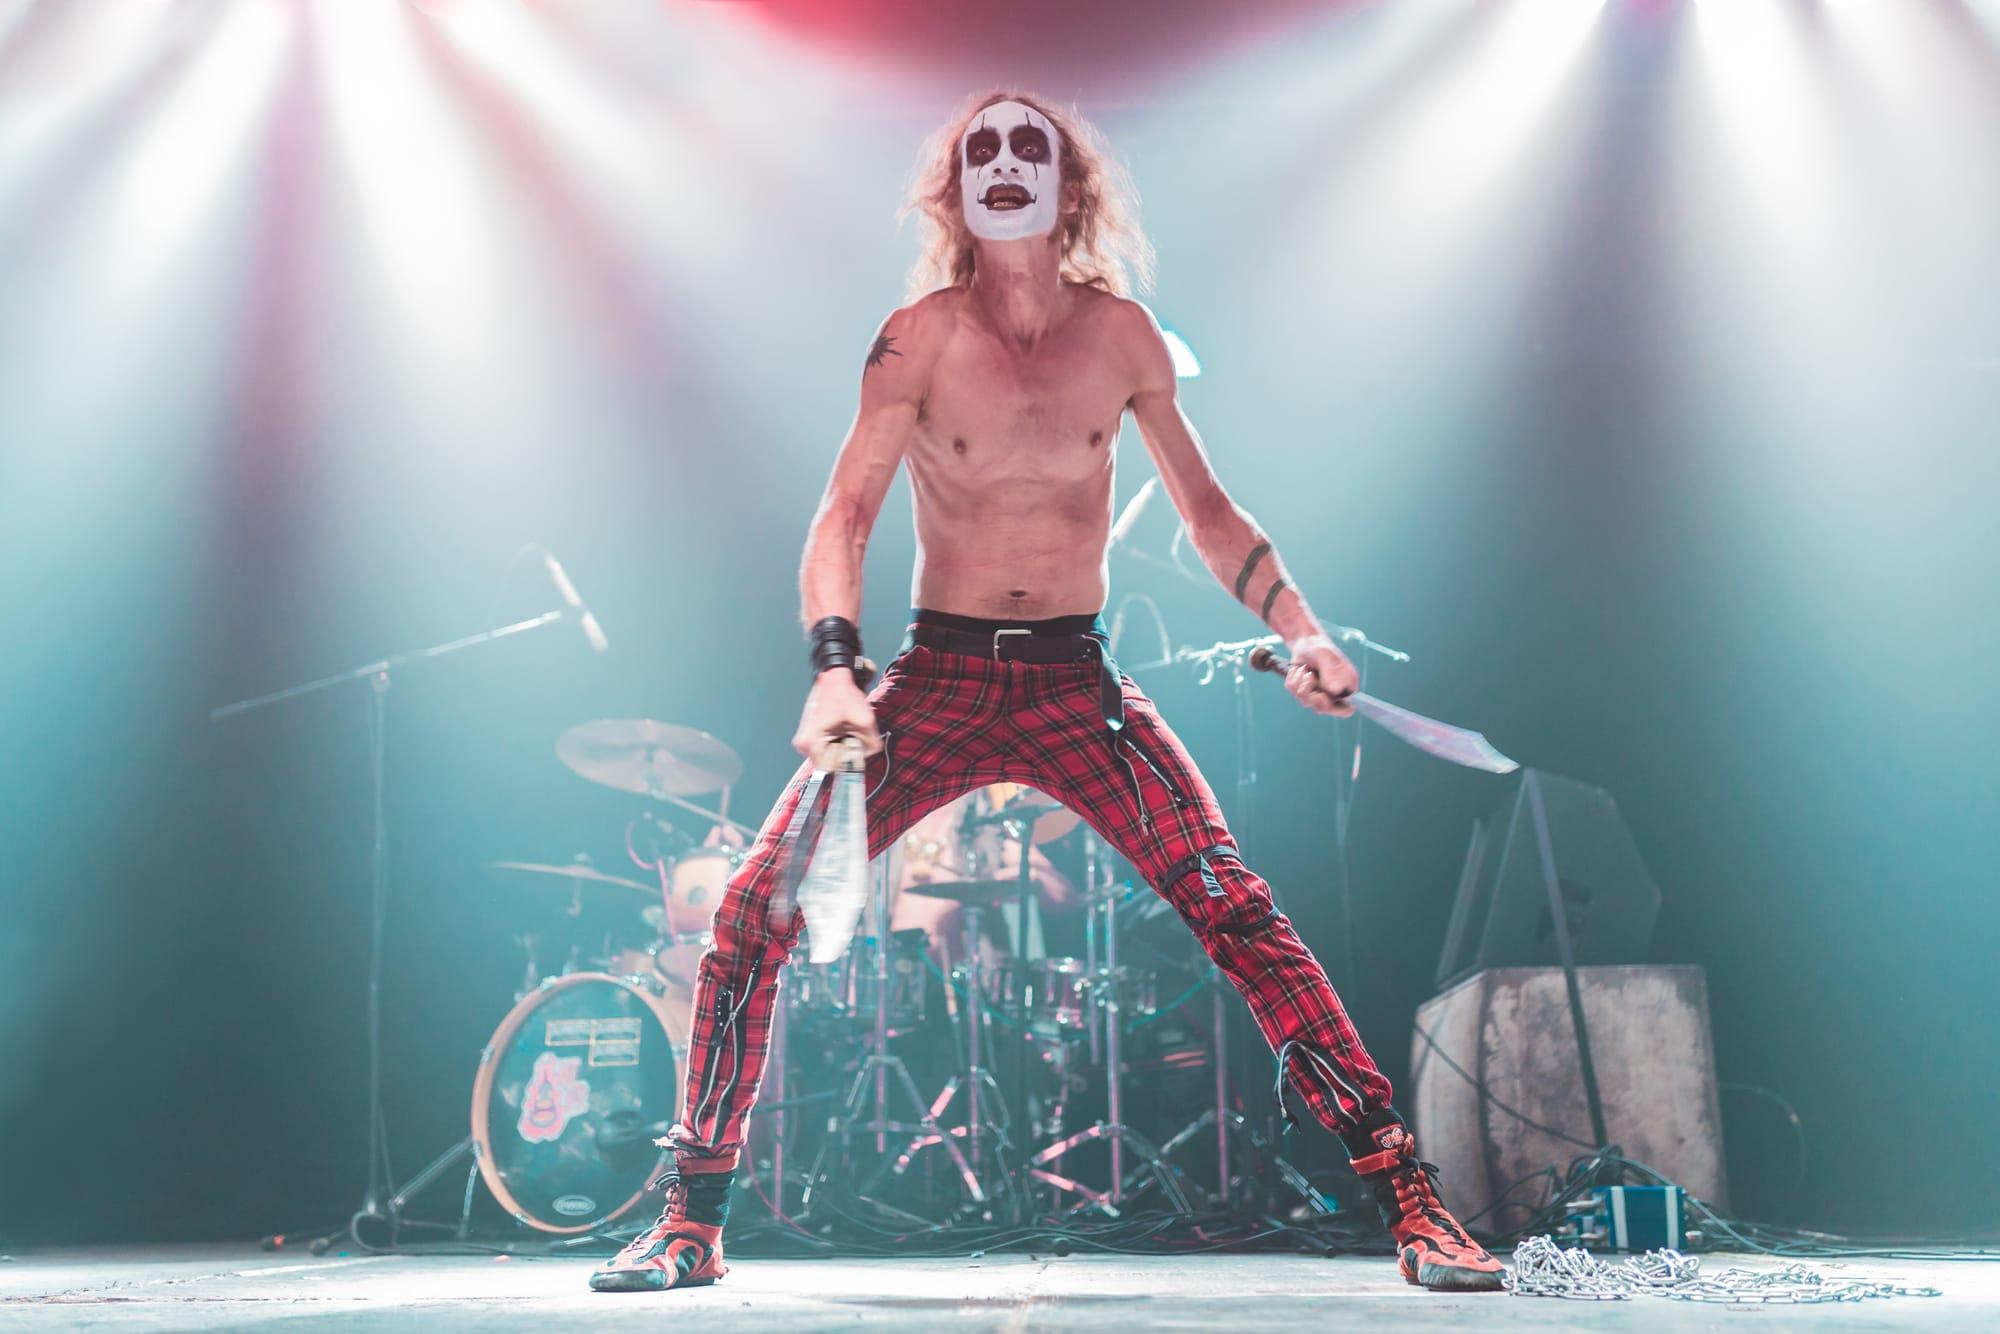 Heavy Metal Pete ©Leora Bermeister